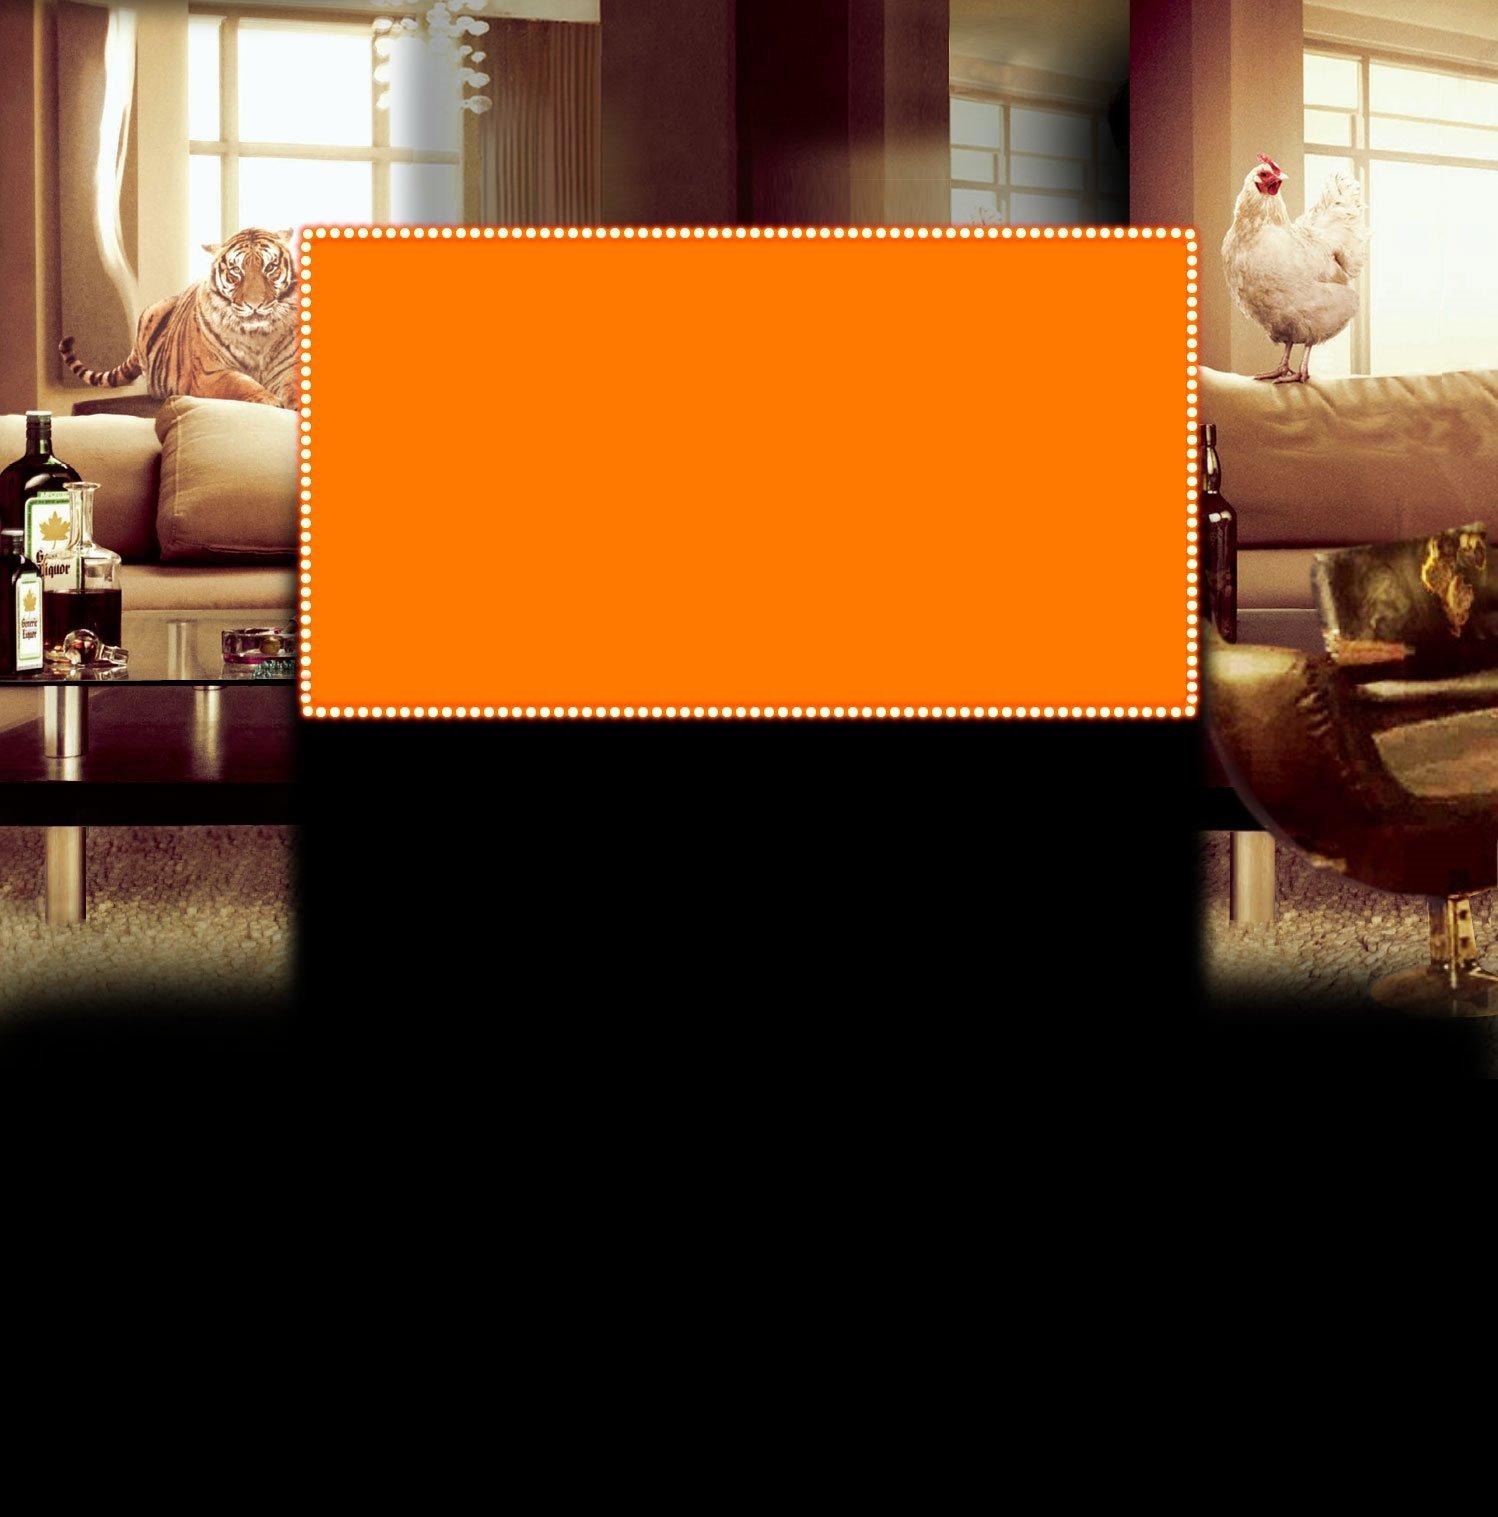 http://i1.ytimg.com/bg/X_tK4UidZ4KzxAAB7lAB8A/default.jpg?app=bg&v=6673c3